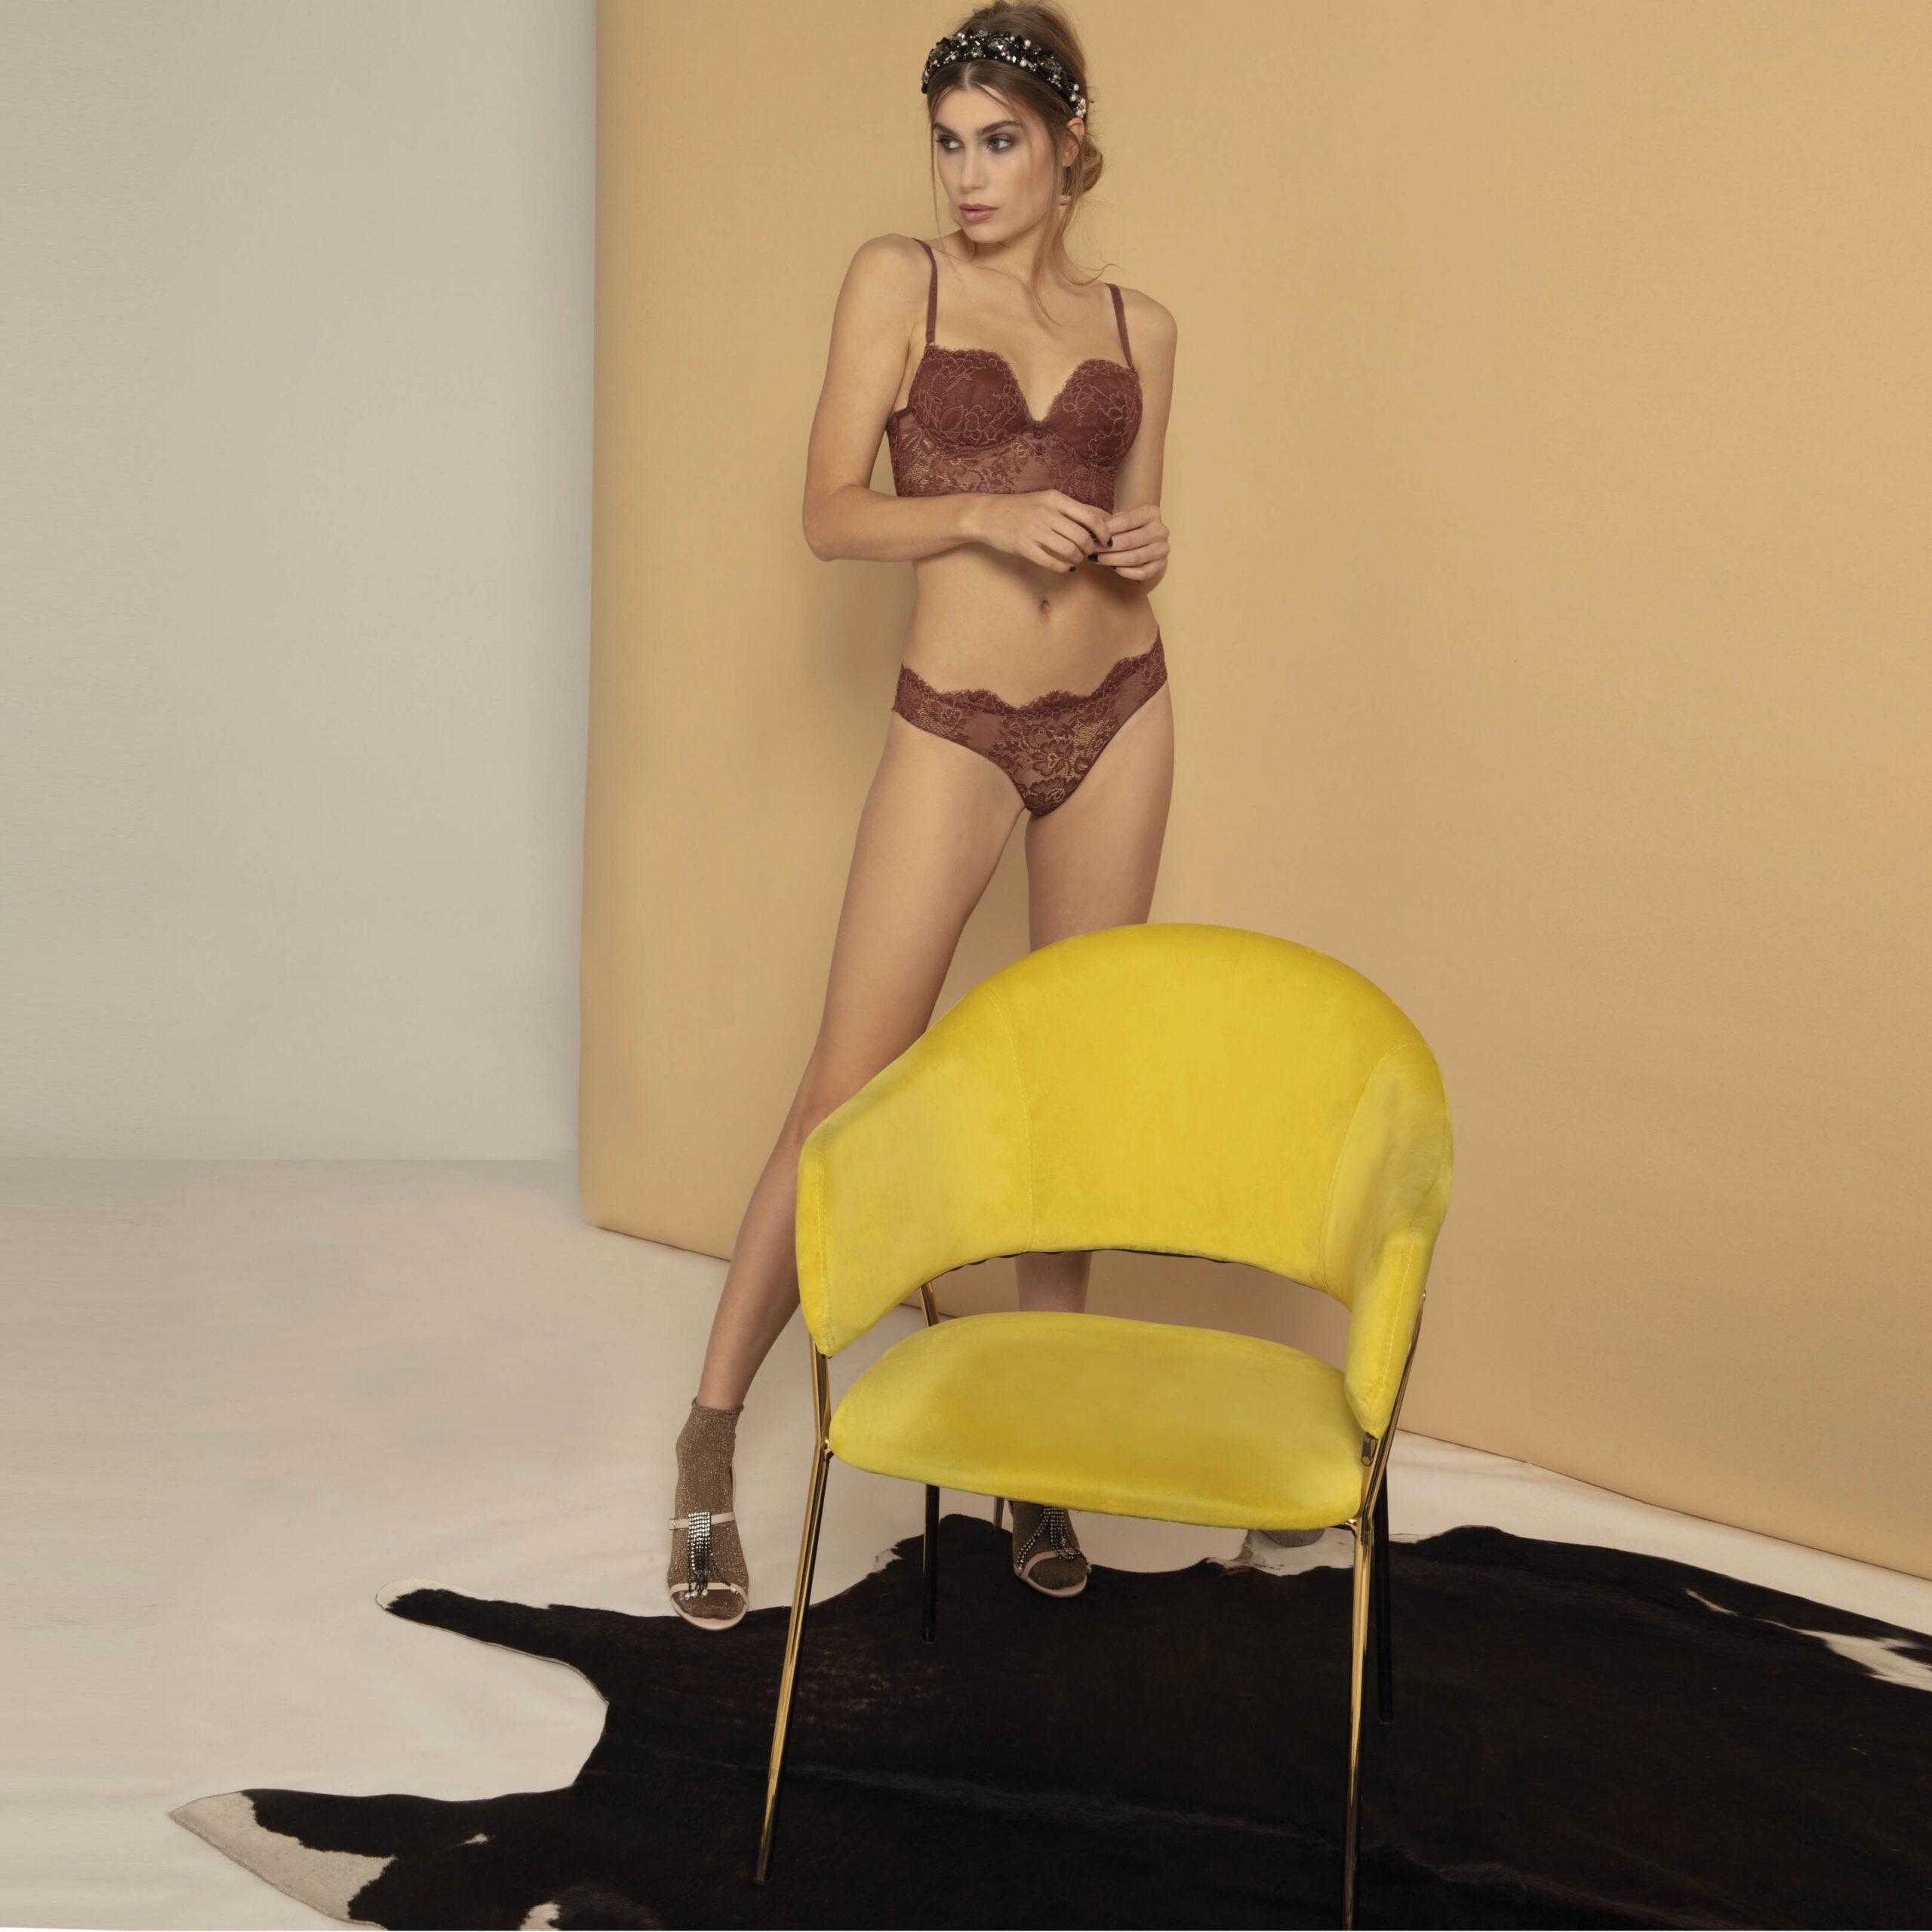 body-pizzo-terra-bronzo-valery-lingerie-biancheria-intima-donna-autunno-inverno-2022